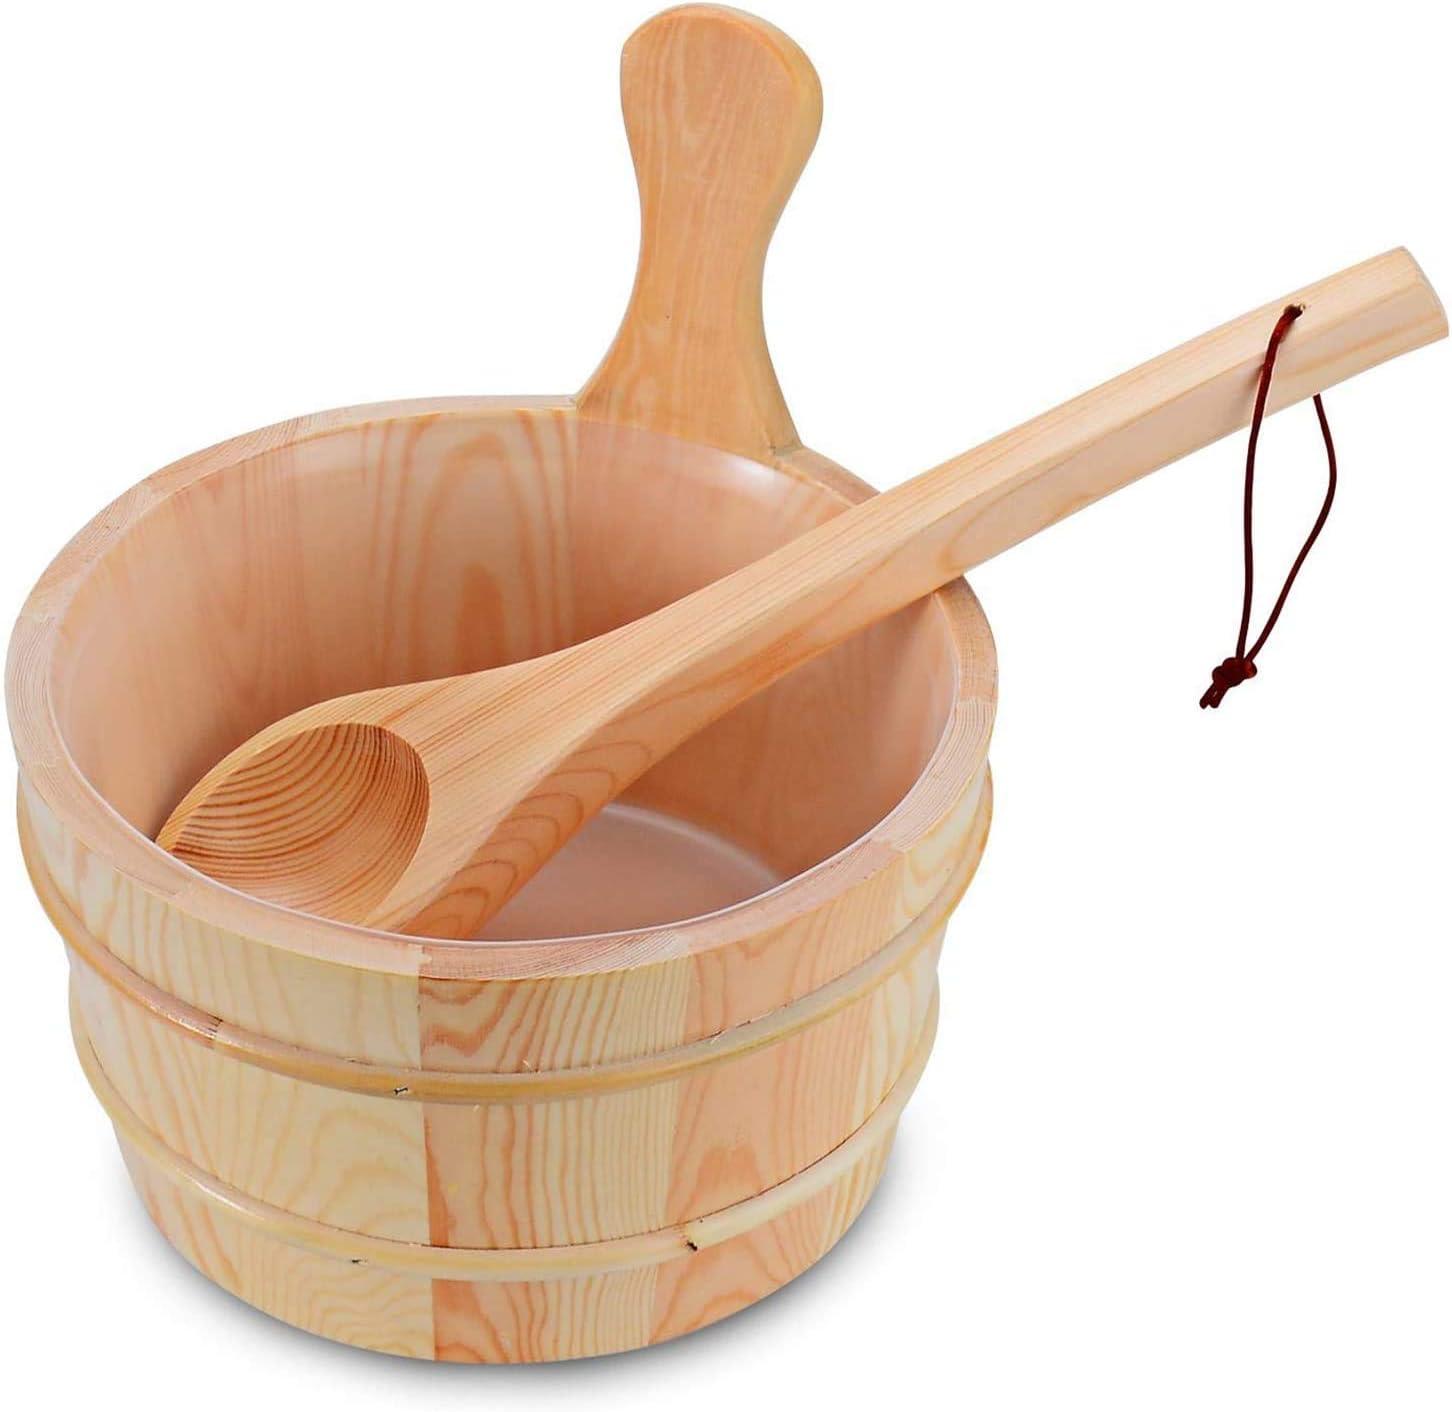 BESTNEWIE Wooden Sauna Bucket and Ladle Handmade Sauna and Spa Accessory - Wooden Sauna Bucket 4 Liter (1 Gallon) …